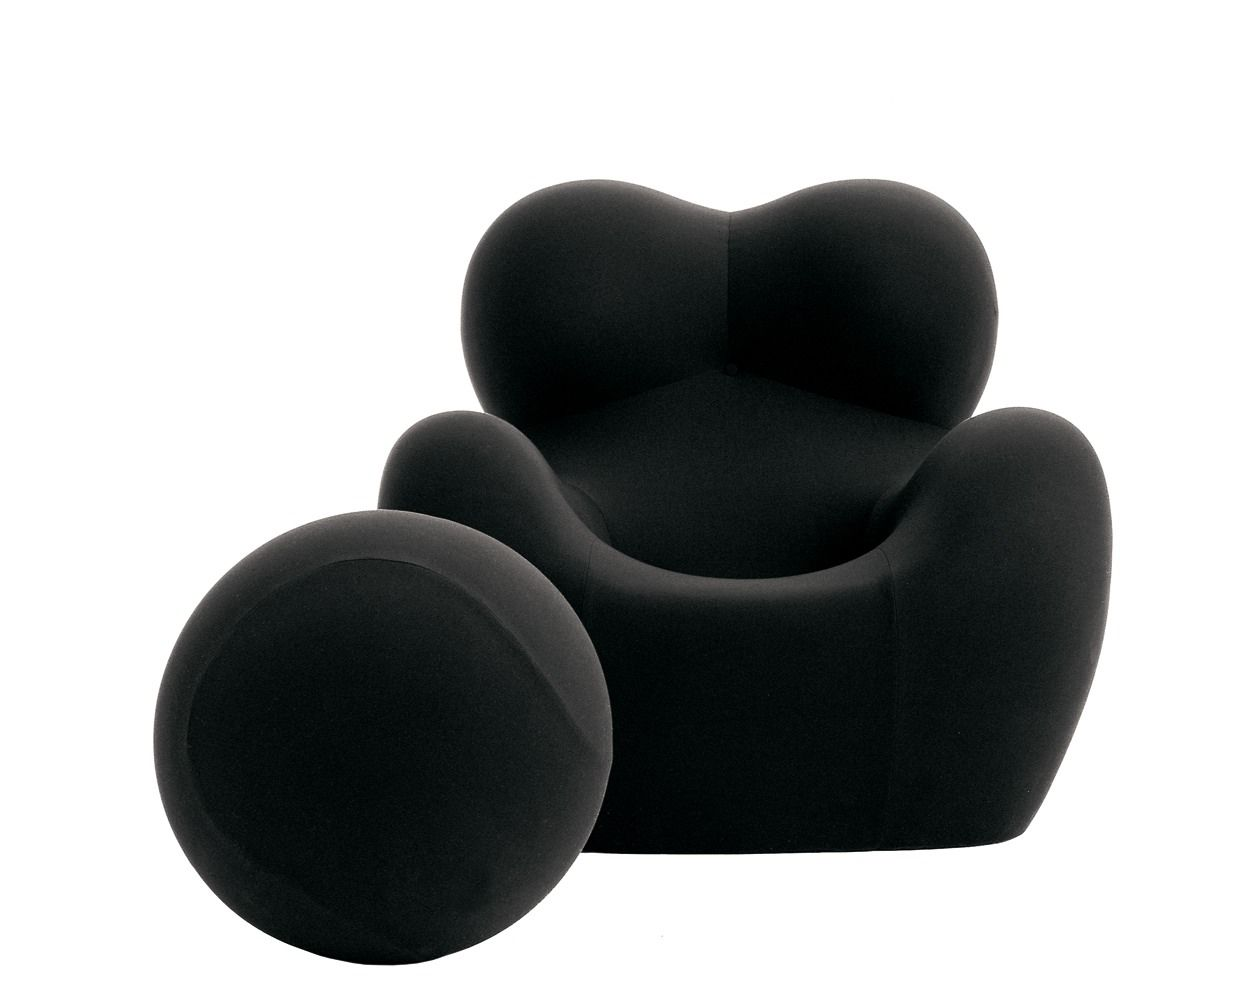 Armchair: SERIE UP 2000 - Collection: B&B Italia - Design: Gaetano ...